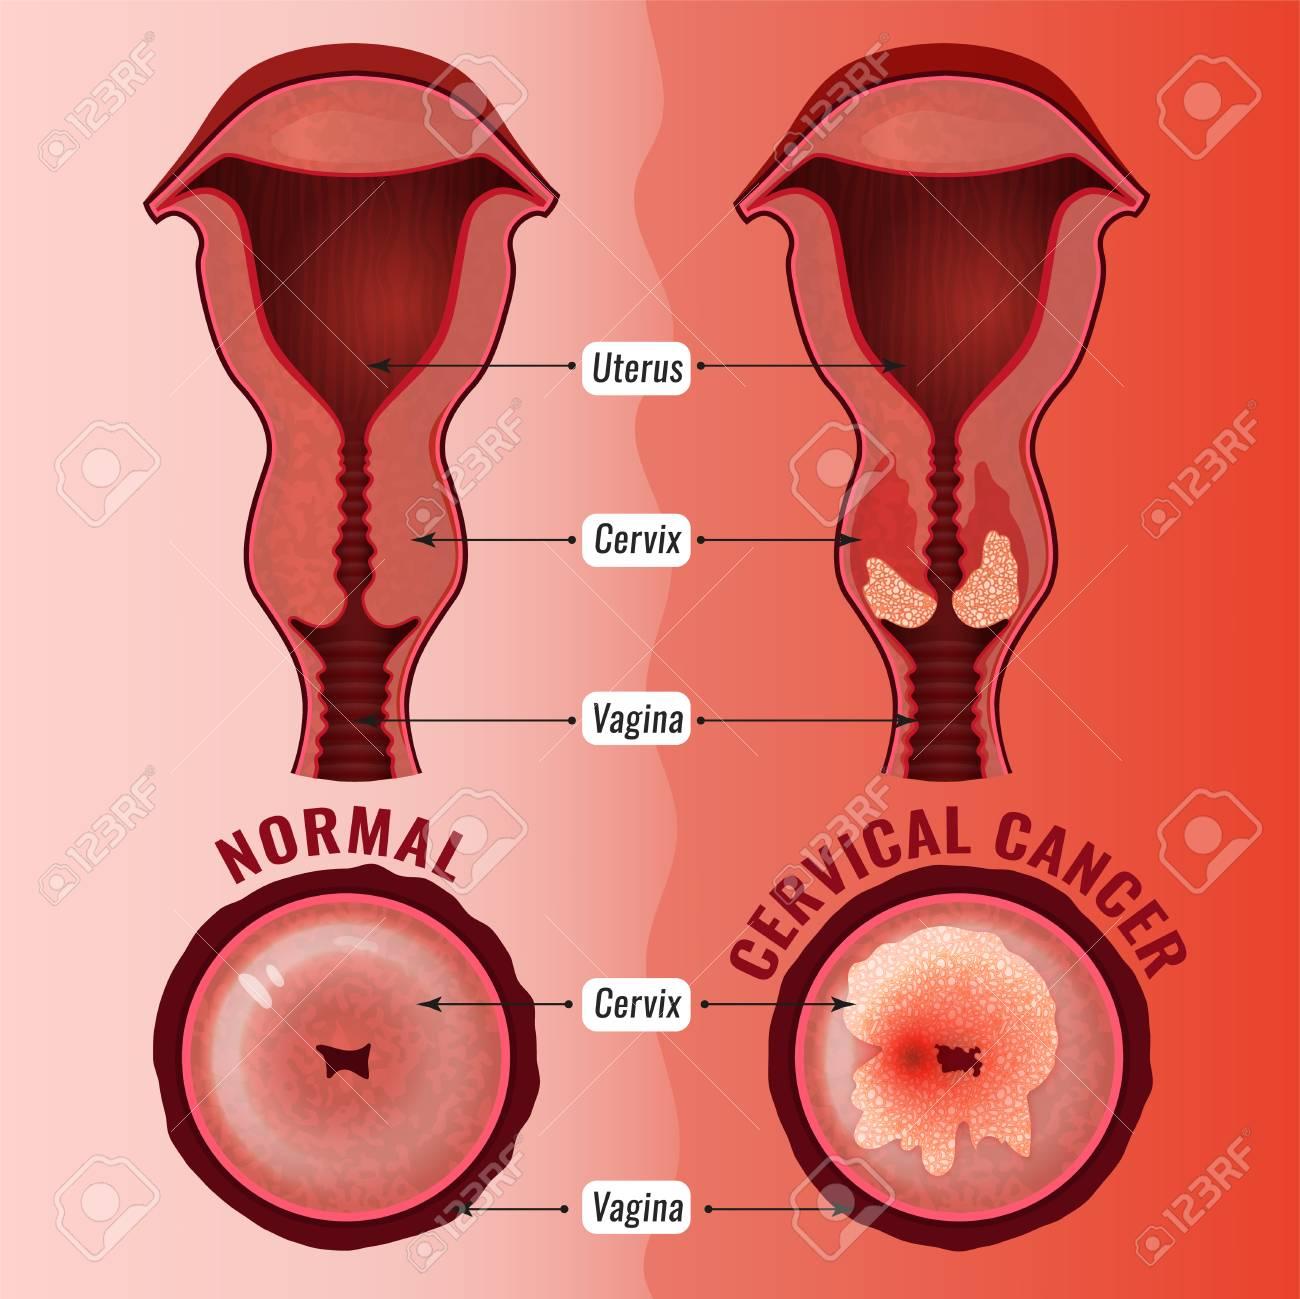 cancer cuello uter)